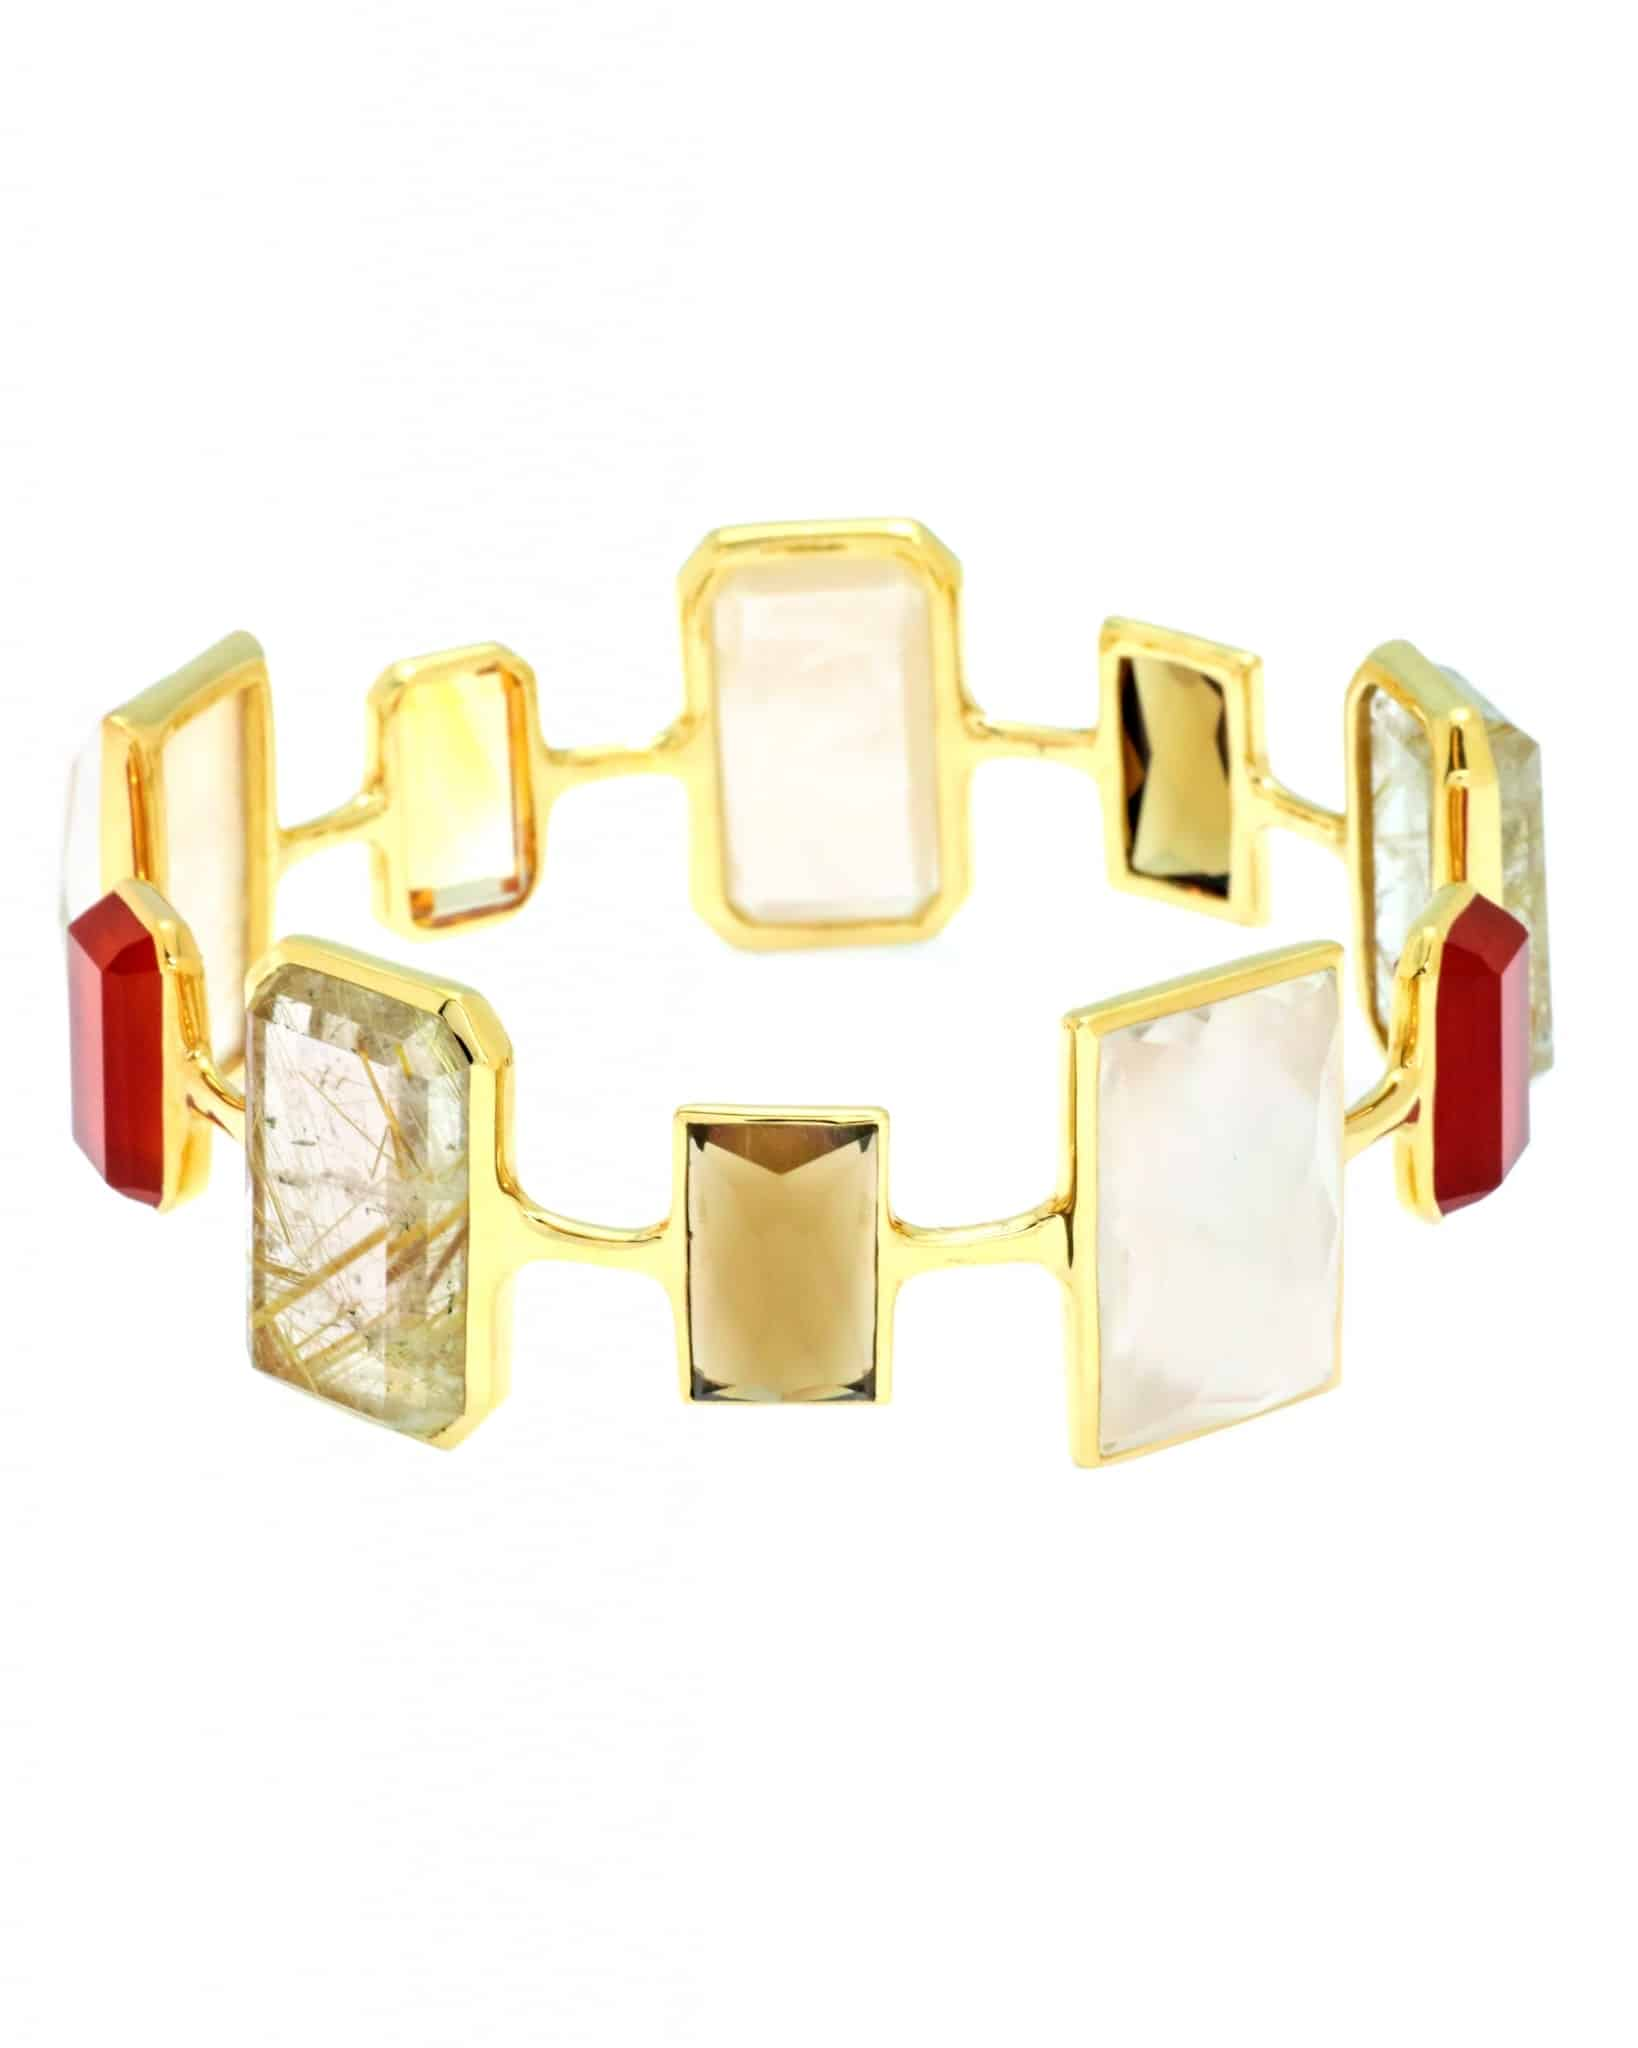 IPPOLITA 18K Rock Candy Gelato 10-Stone Bangle Bracelet GB629CASABLANC